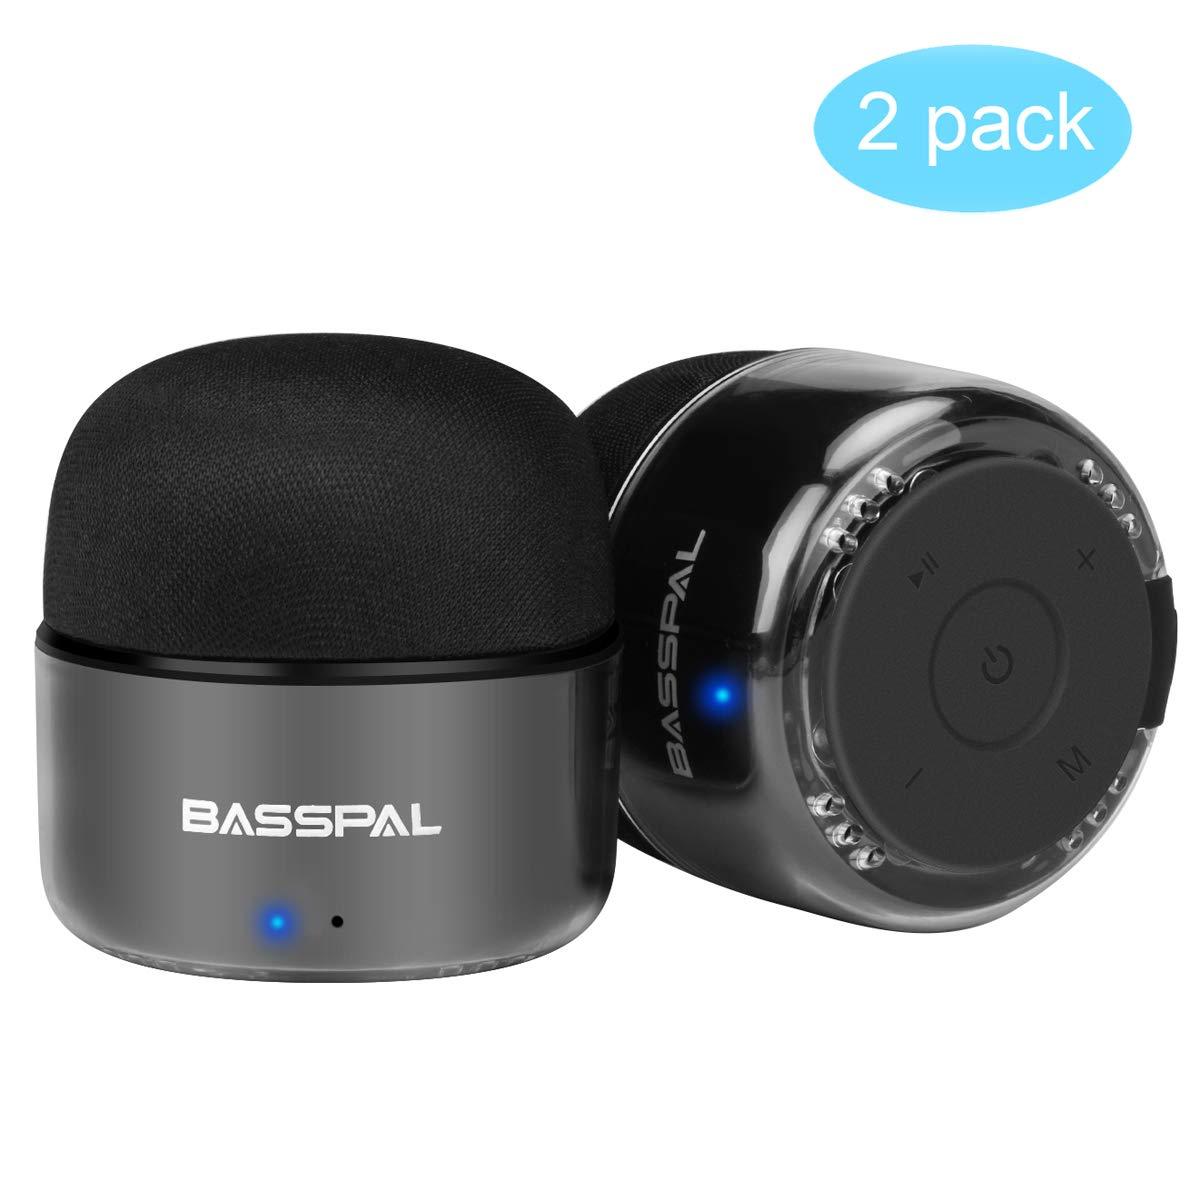 BassPal Portable Bluetooth Waterproof Outdoor 2